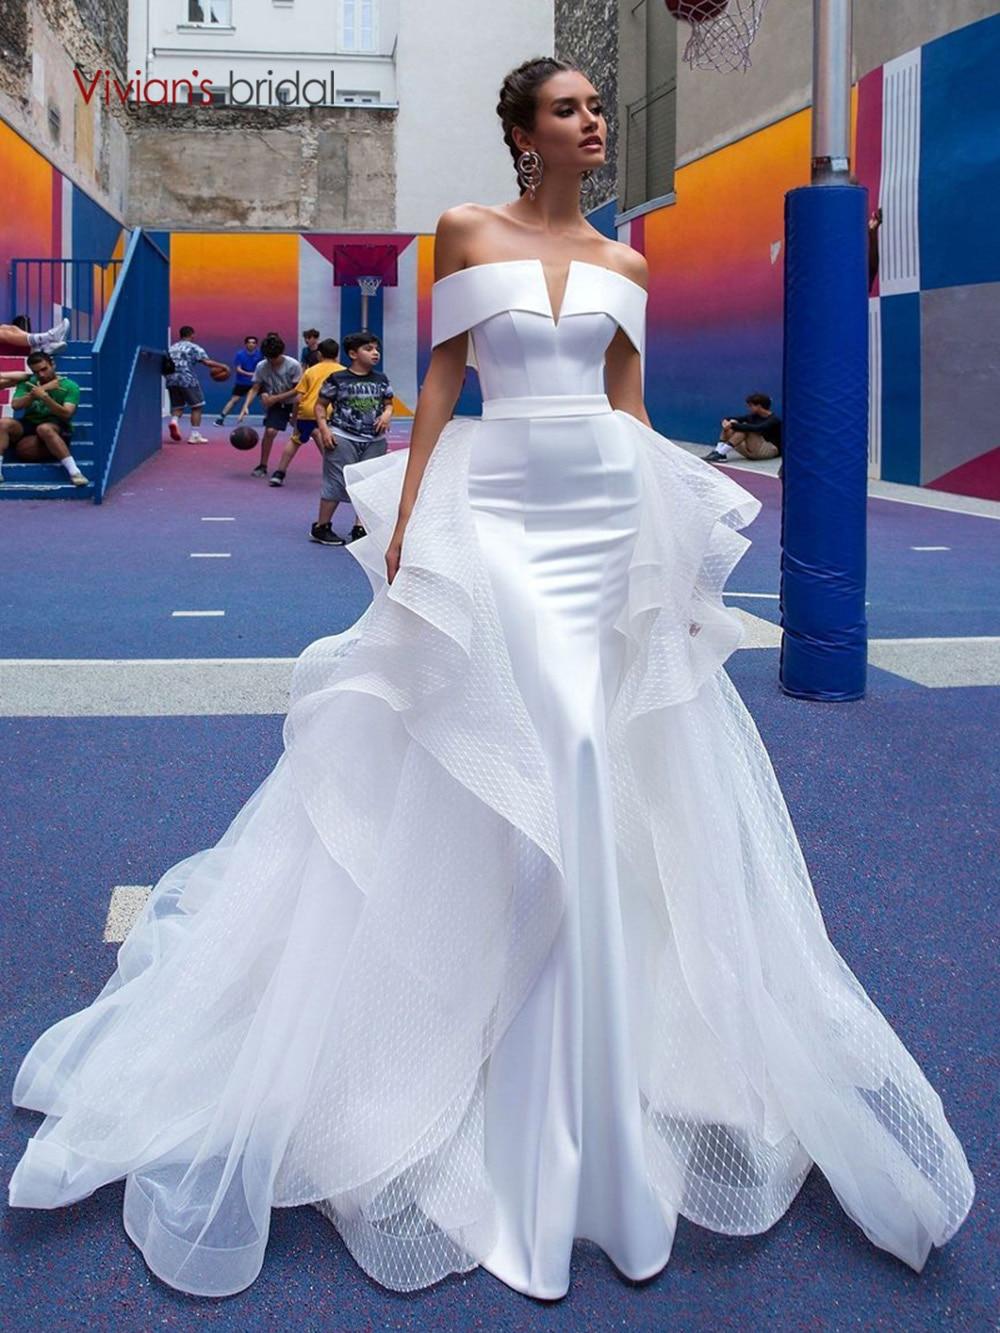 Vivian's Bridal 2019 Hot Reflective Dress Satin Wedding Dress Sexy Strapless Off Shoulder Detachable Train Mermaid Bridal Dress